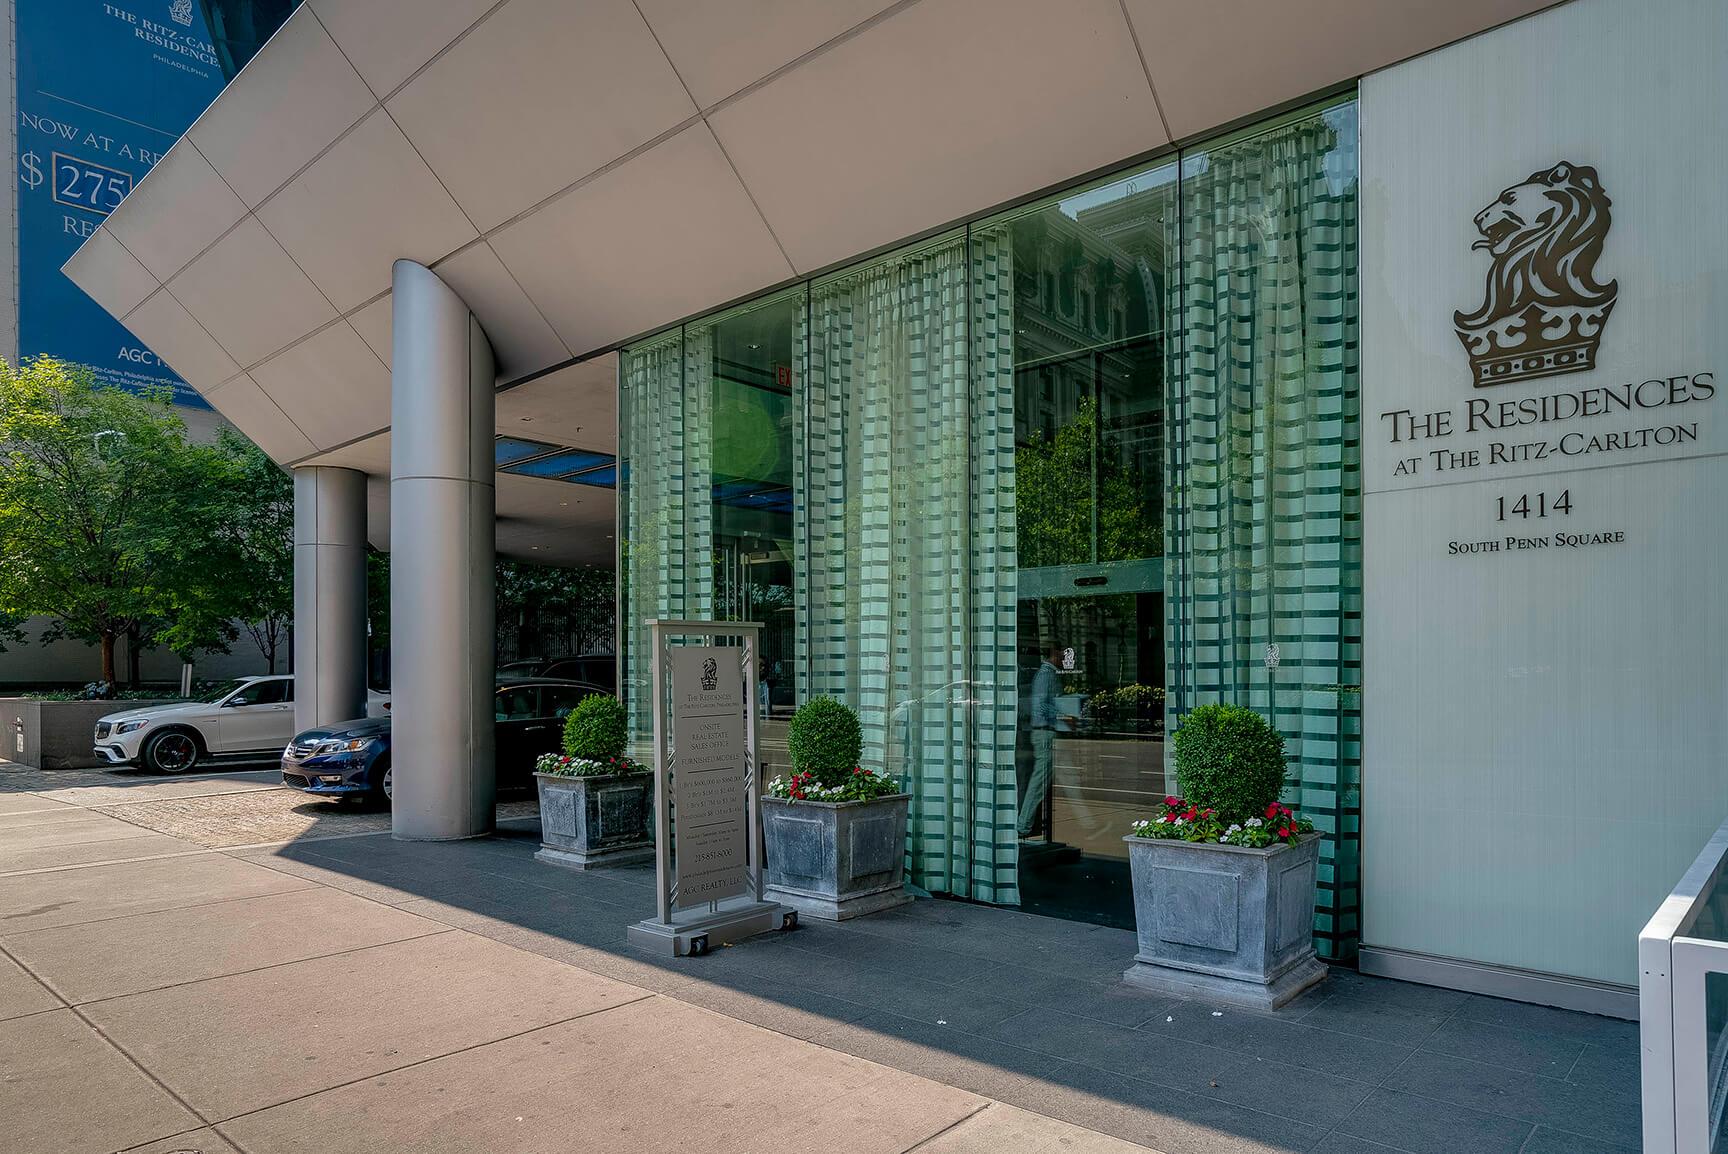 Philadelphia Luxury Home Condo-the ritz carlton residences bryant wilde realty1.jpg